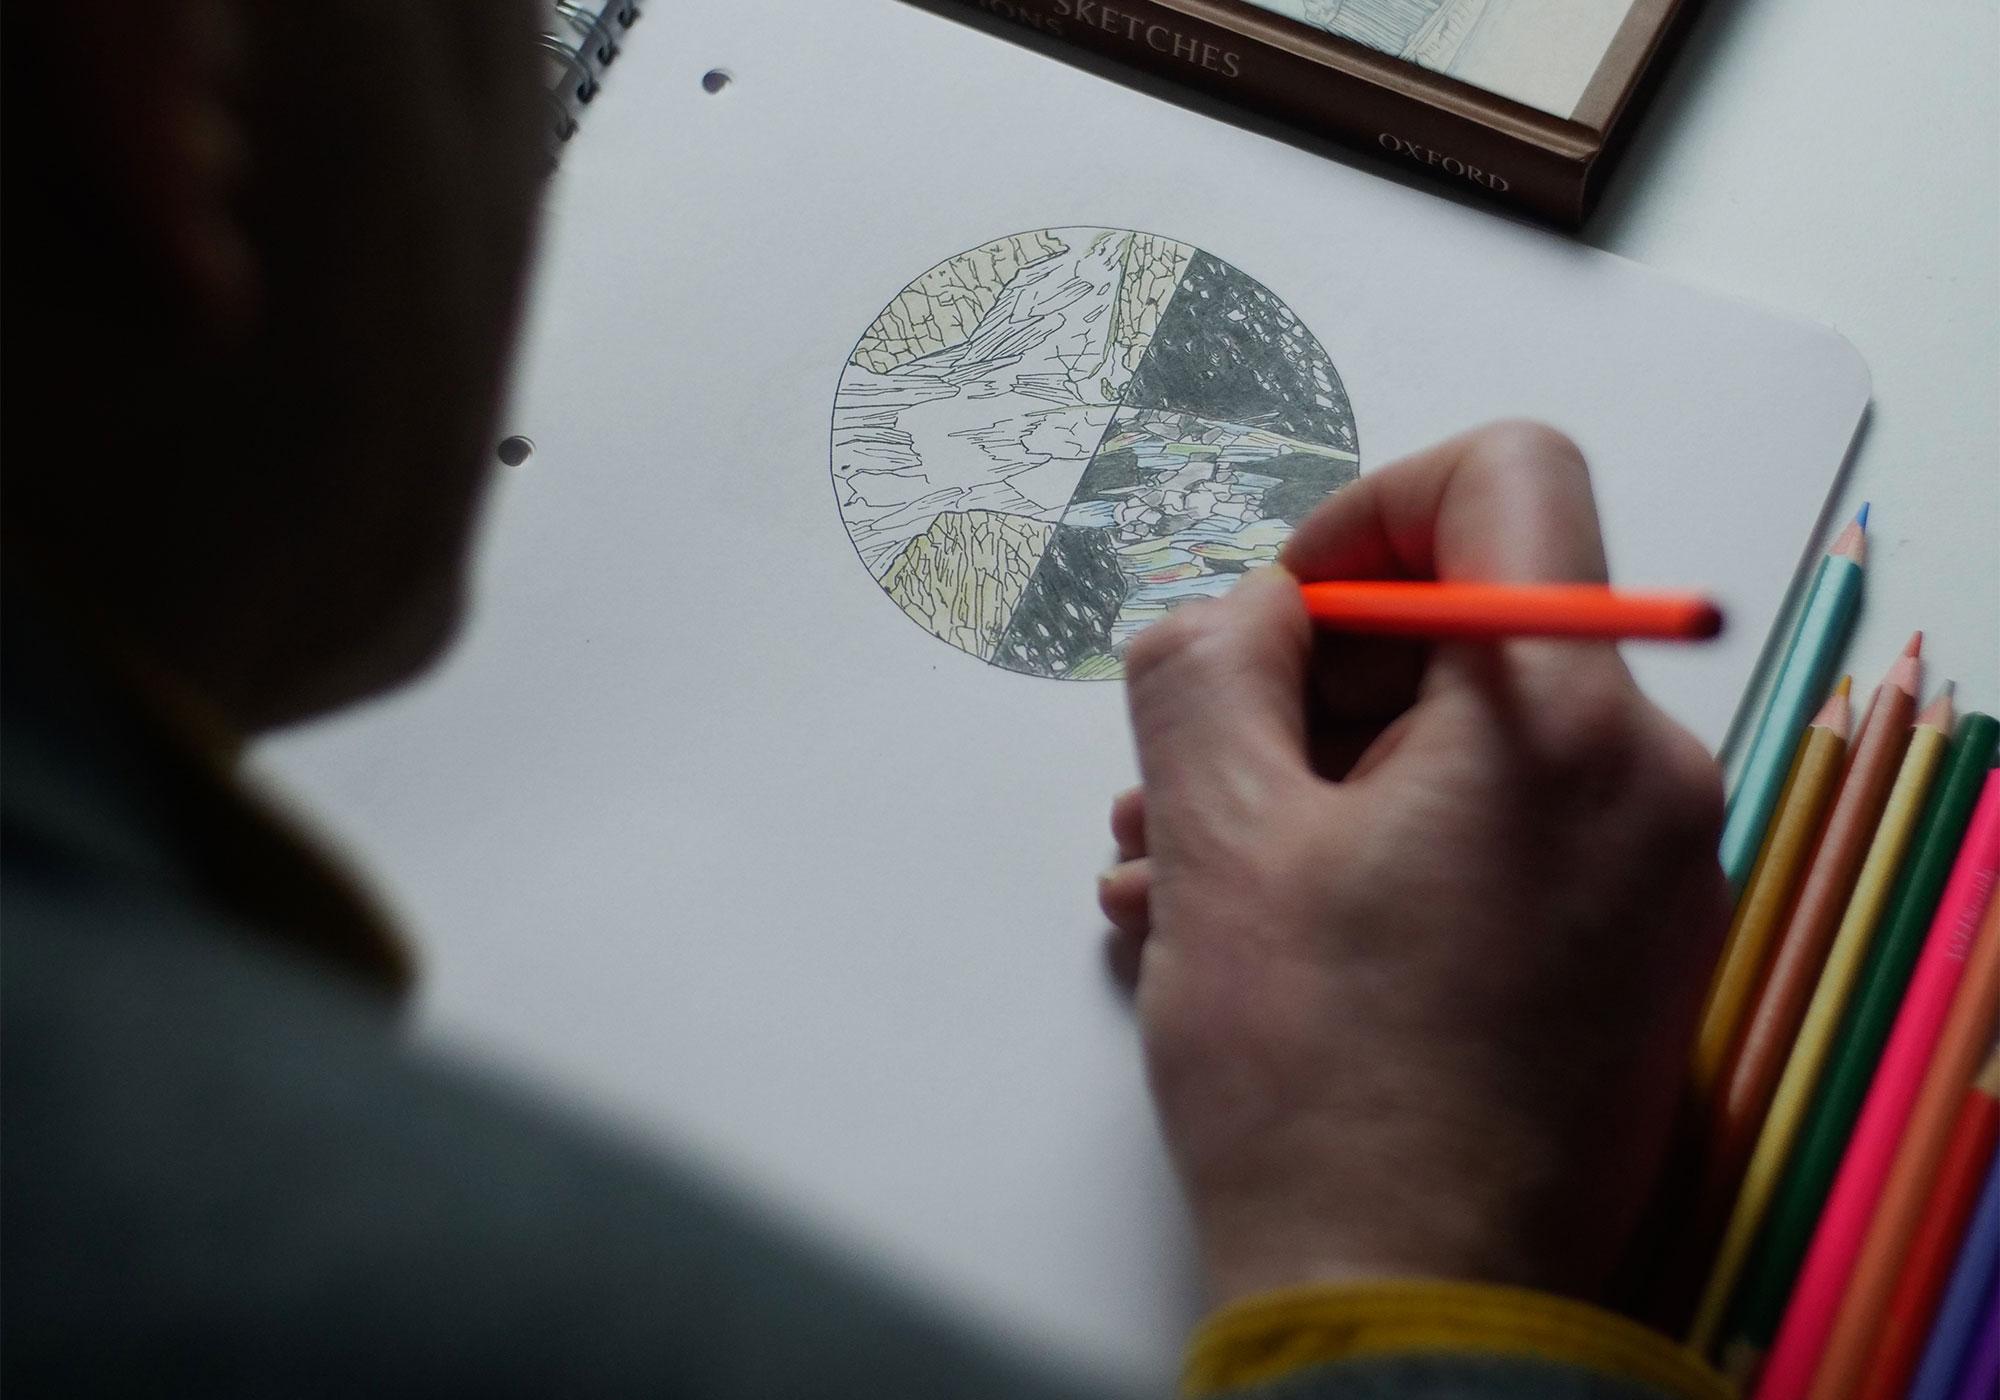 Matt Genge draws a circular slice of rock.